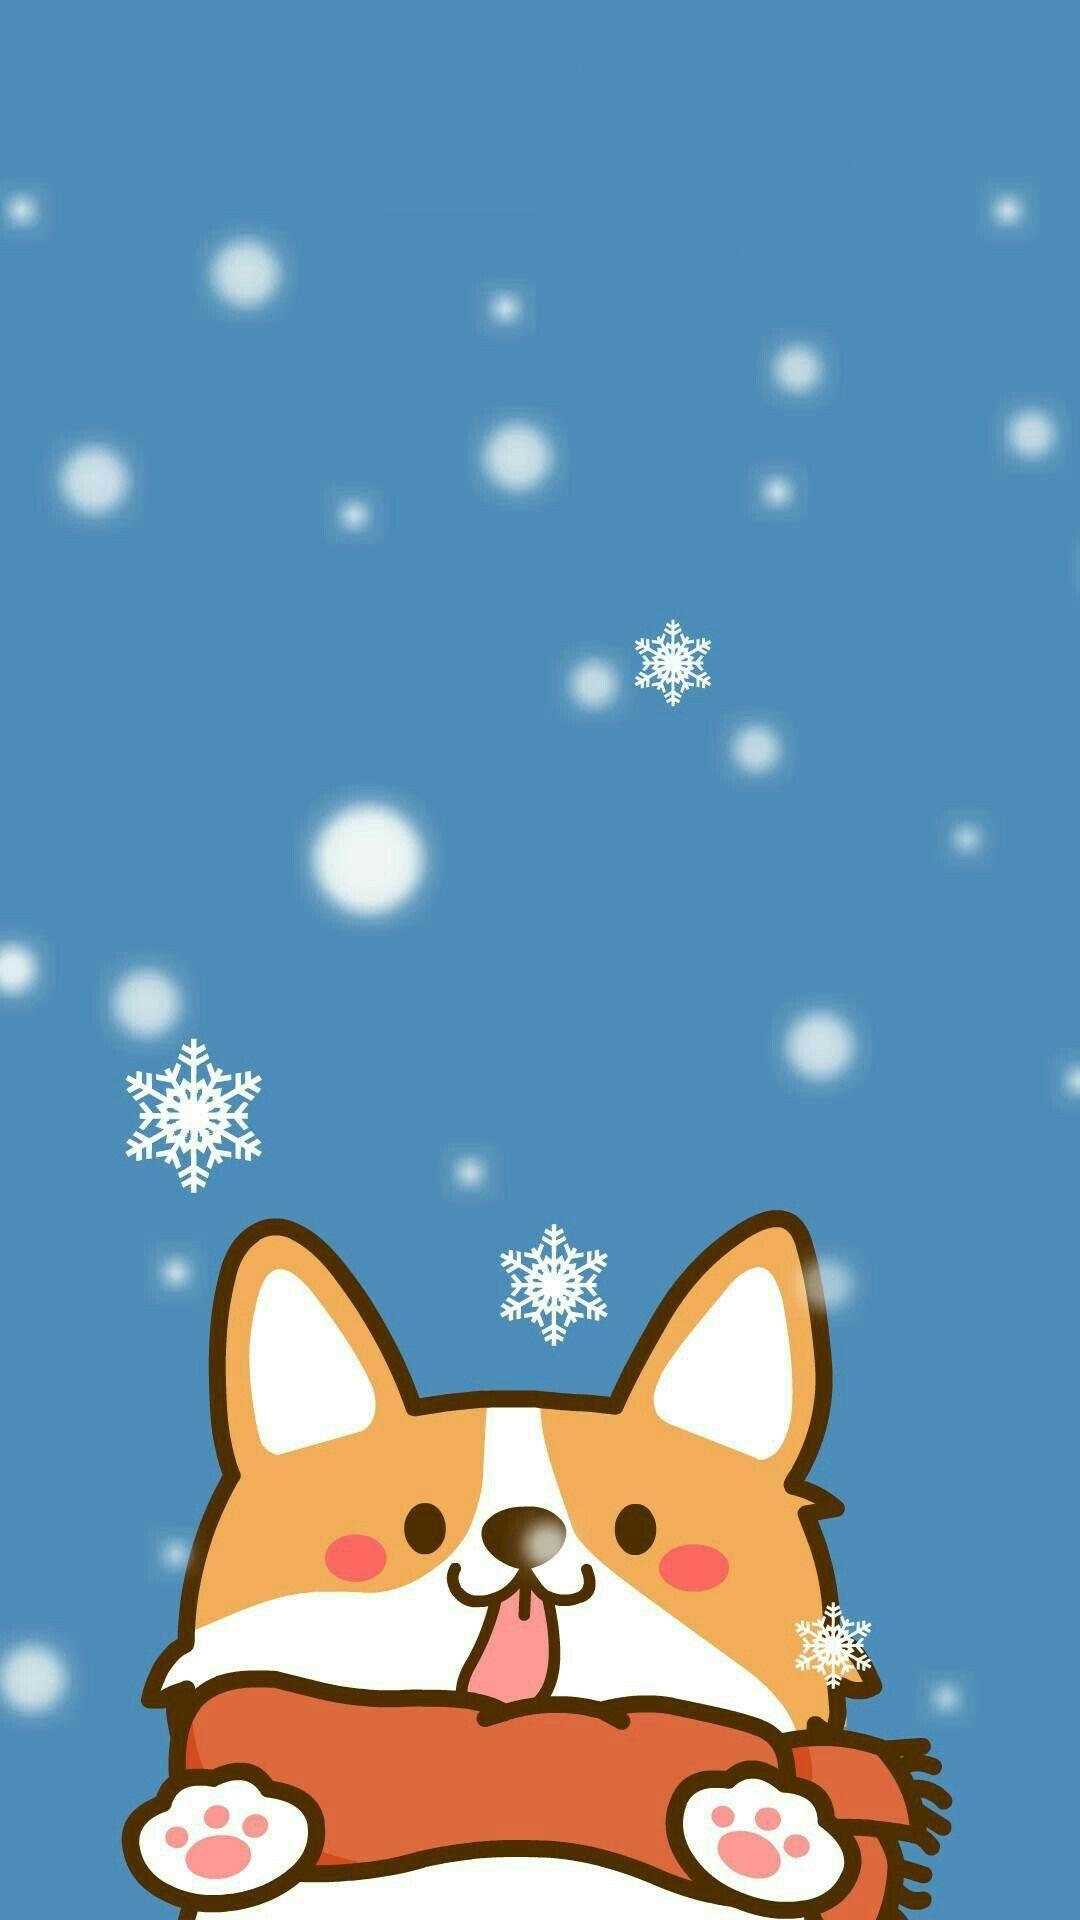 Pin De Barb Thomas Chancey En Backgrounds Fondos De Gato Dibujos Bonitos Dibujos Bonitos De Animales